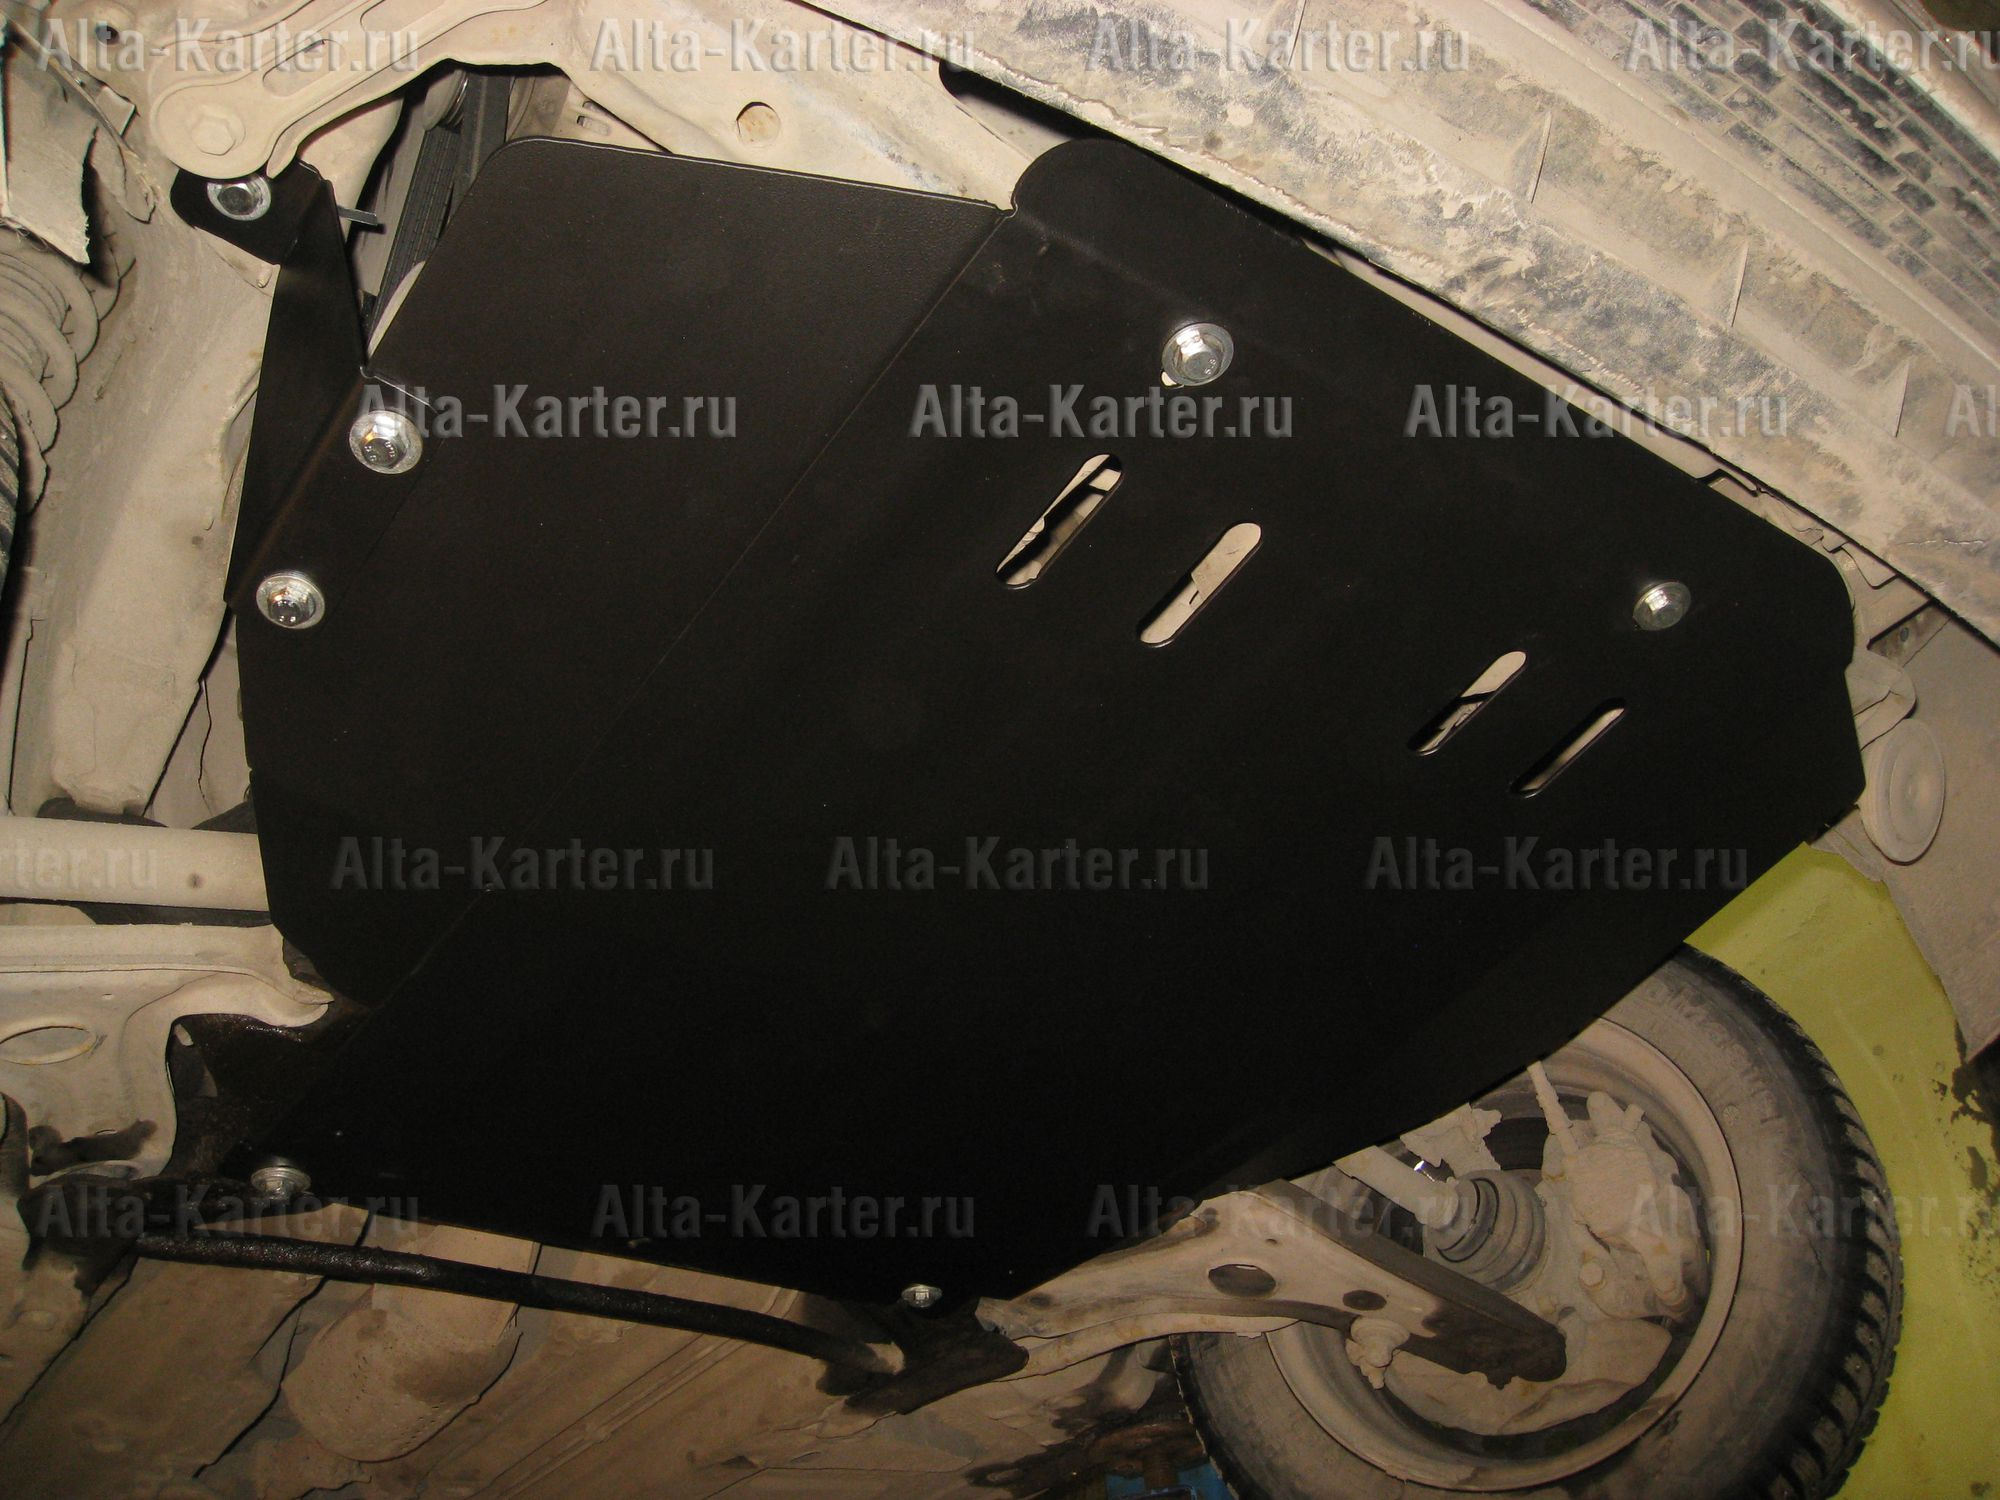 Защита Alfeco для картера и МКПП Volkswagen Passat B3, B4 1988-1997. Артикул ALF.26.25